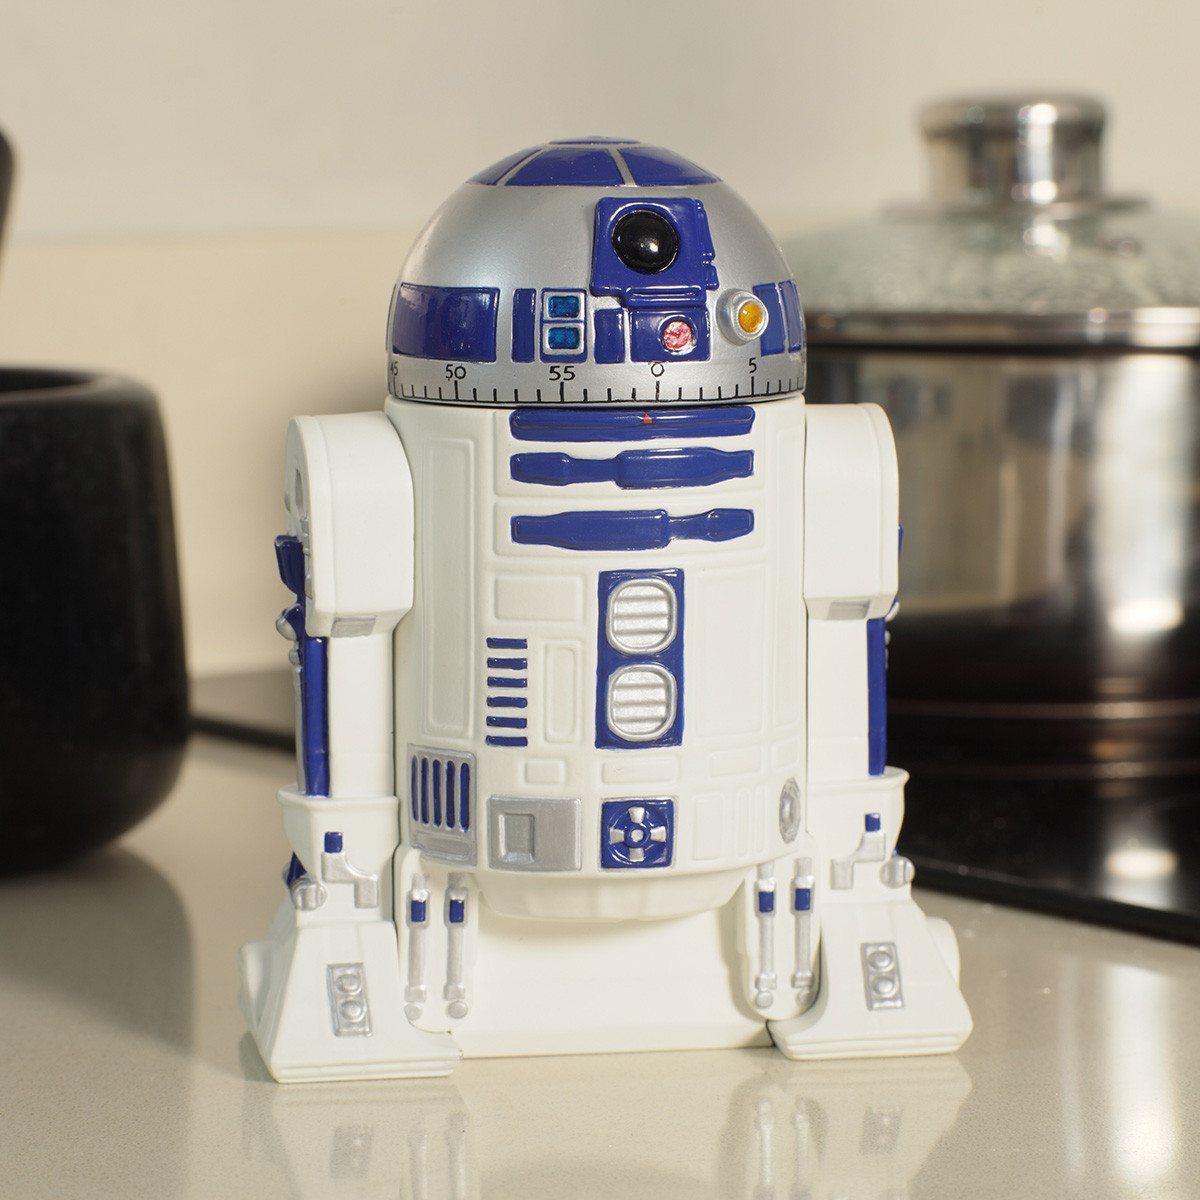 Temporizador de cocina Star Wars